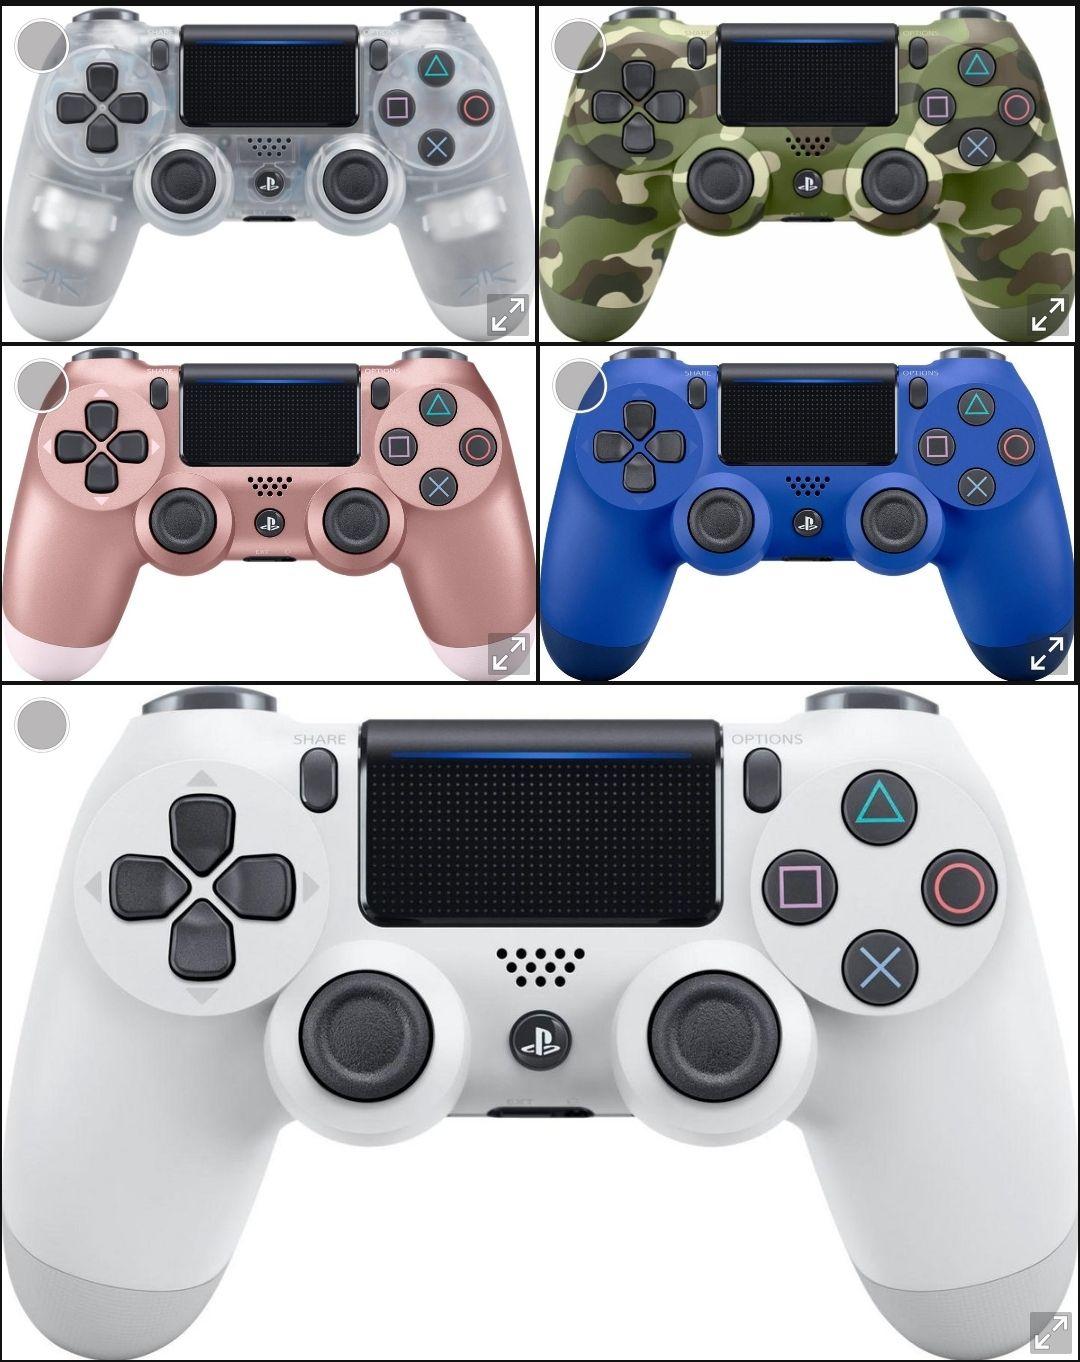 Ps4 controller Dualshock 4 v2 in viele Farben